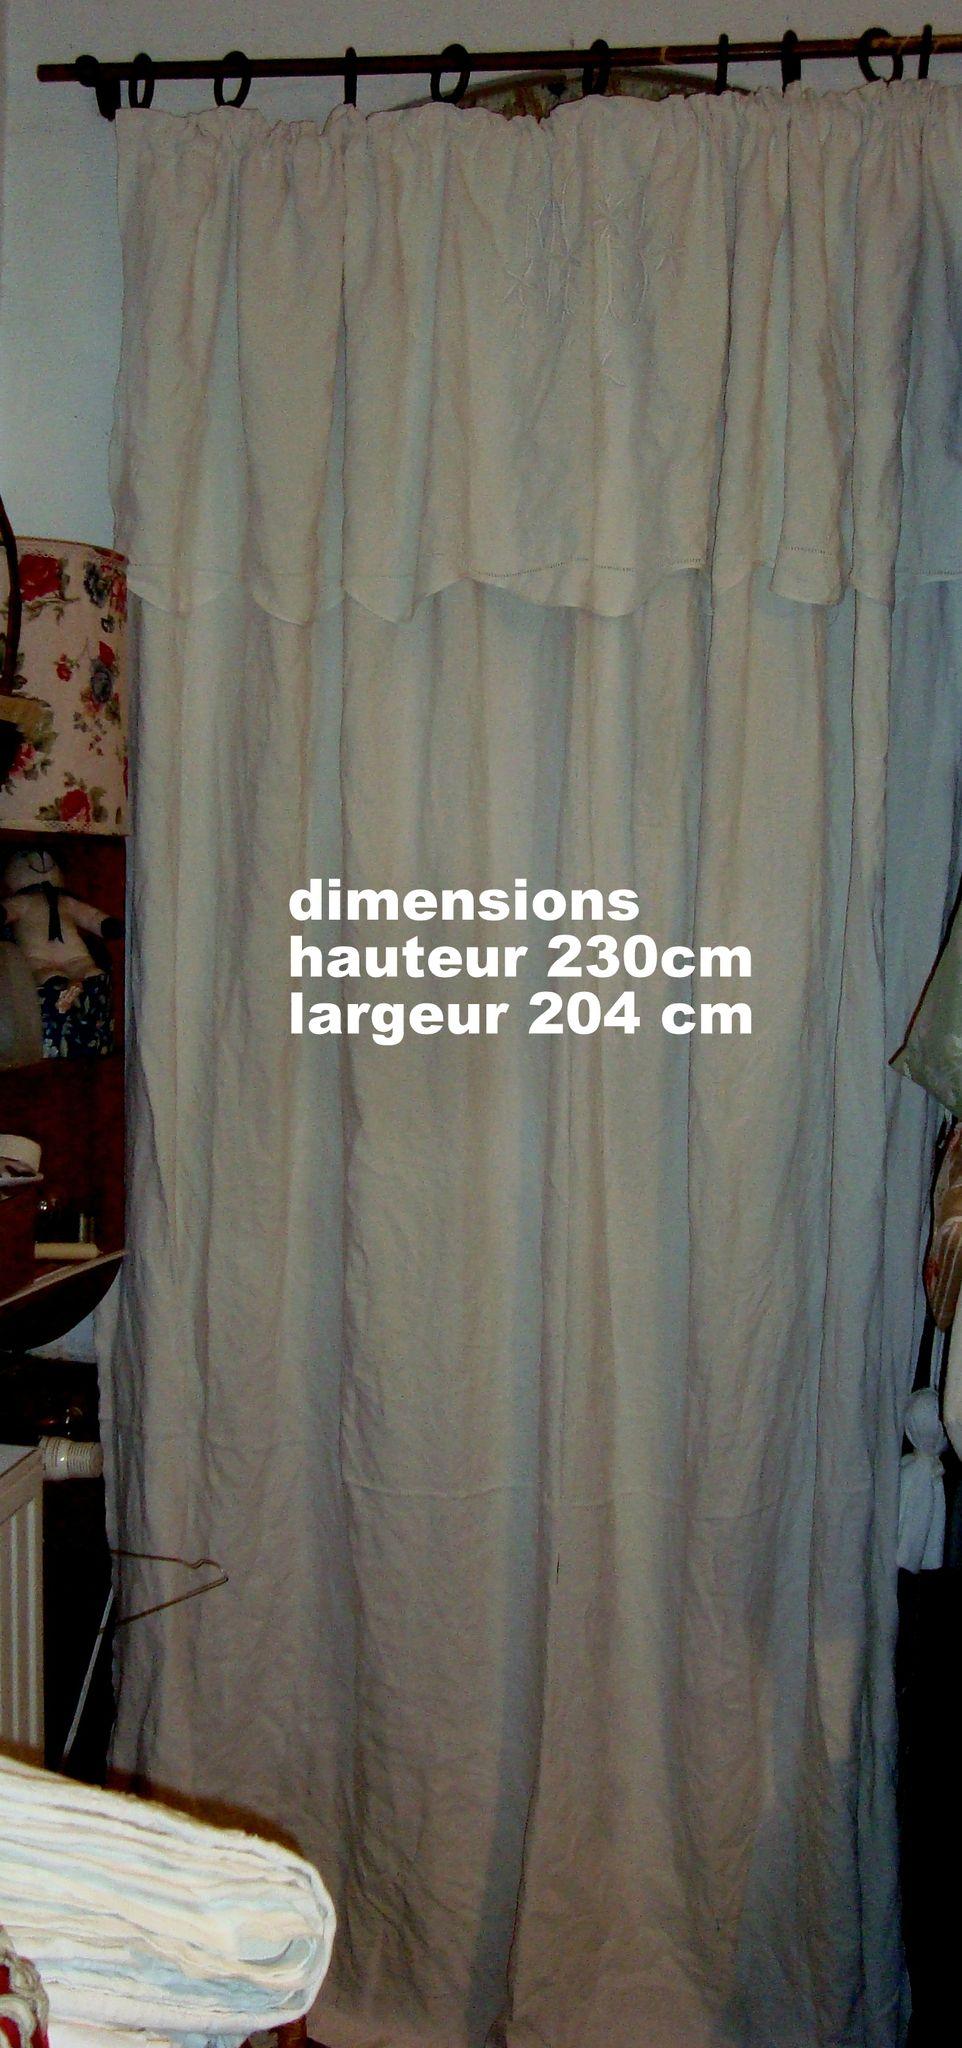 brocante poucel a montmorillon 86. Black Bedroom Furniture Sets. Home Design Ideas